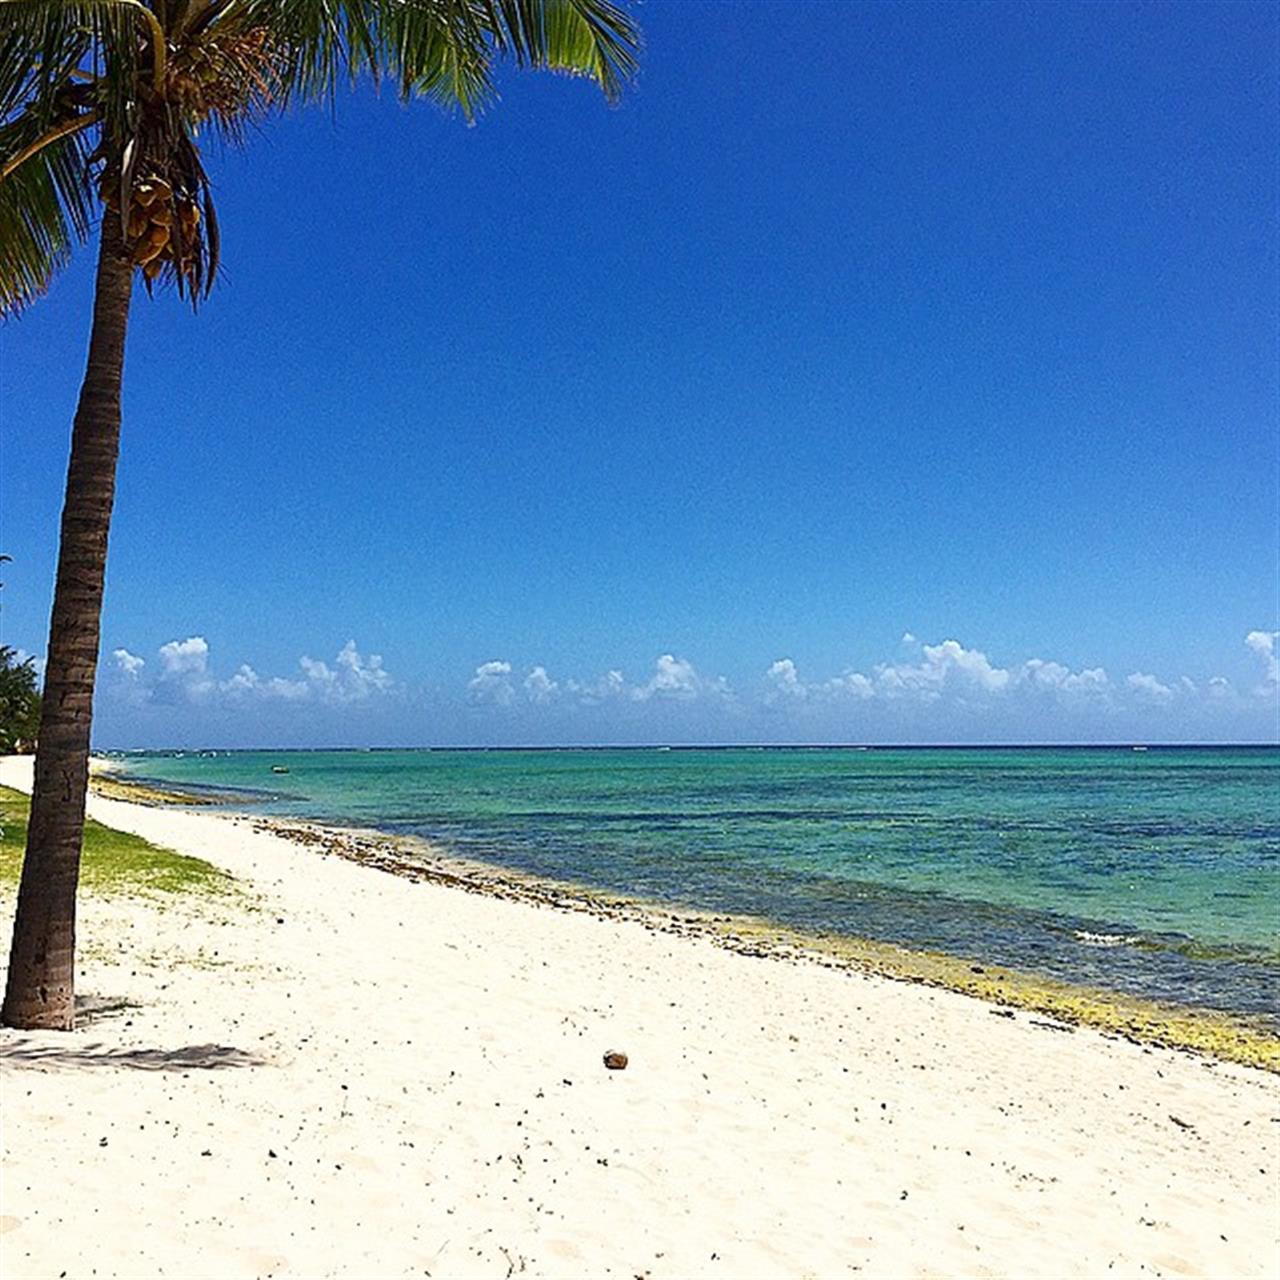 #mauritius #whitesandbeach #beach #LeadingRelocal